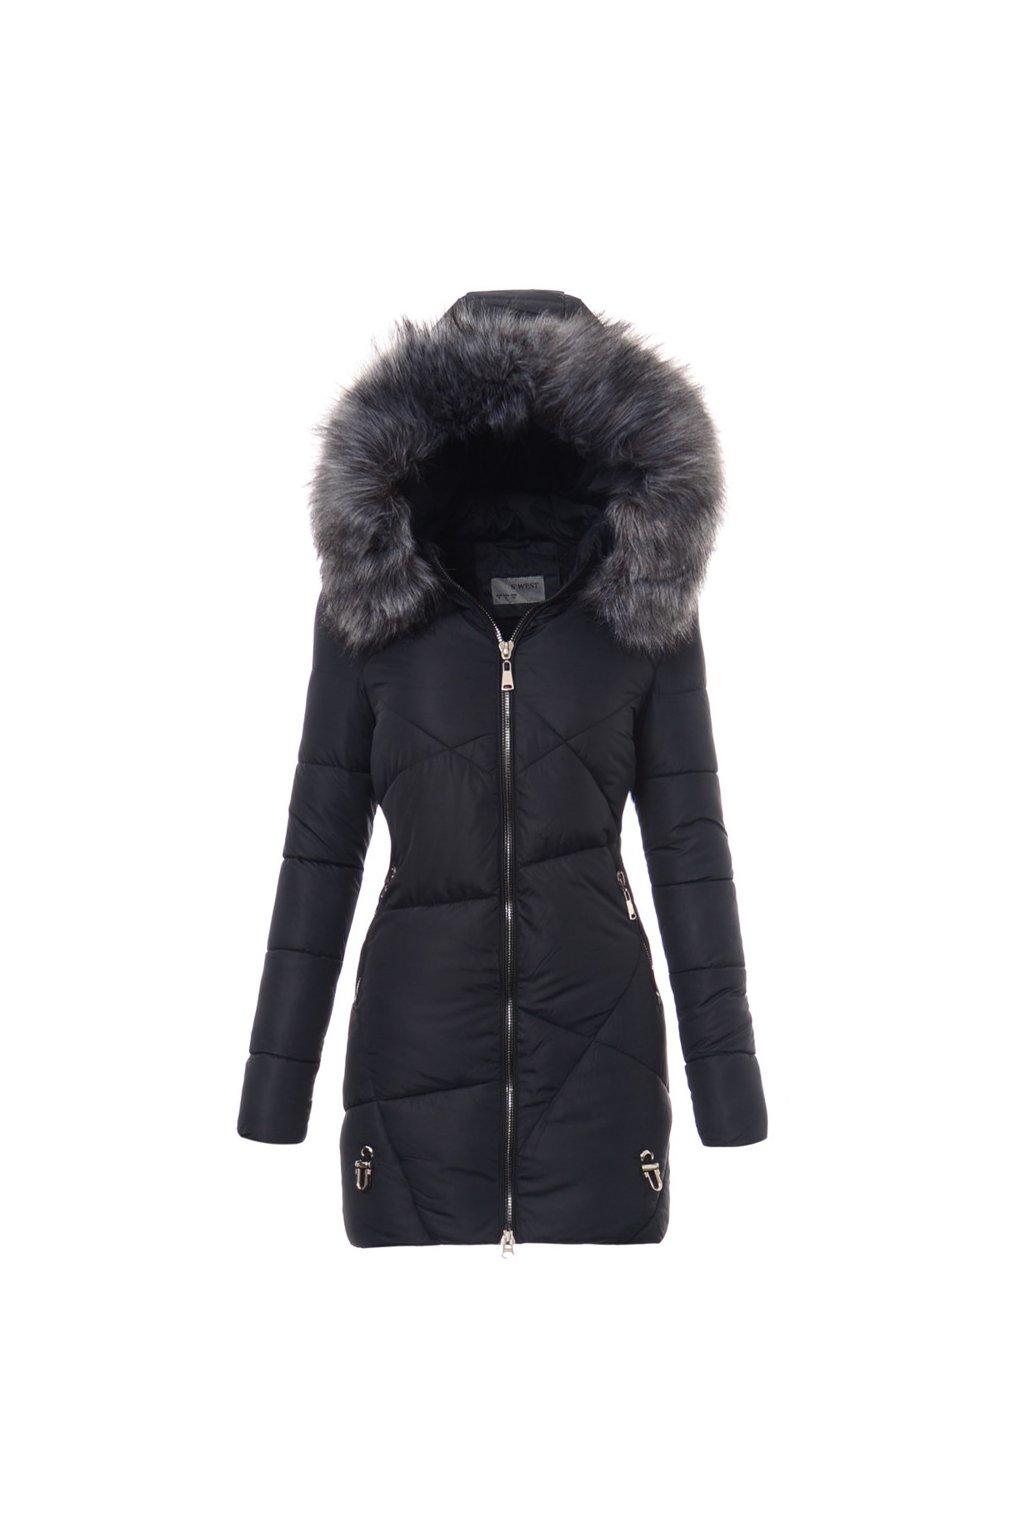 Dámska zimná bunda s kapucňou 4757 modrá